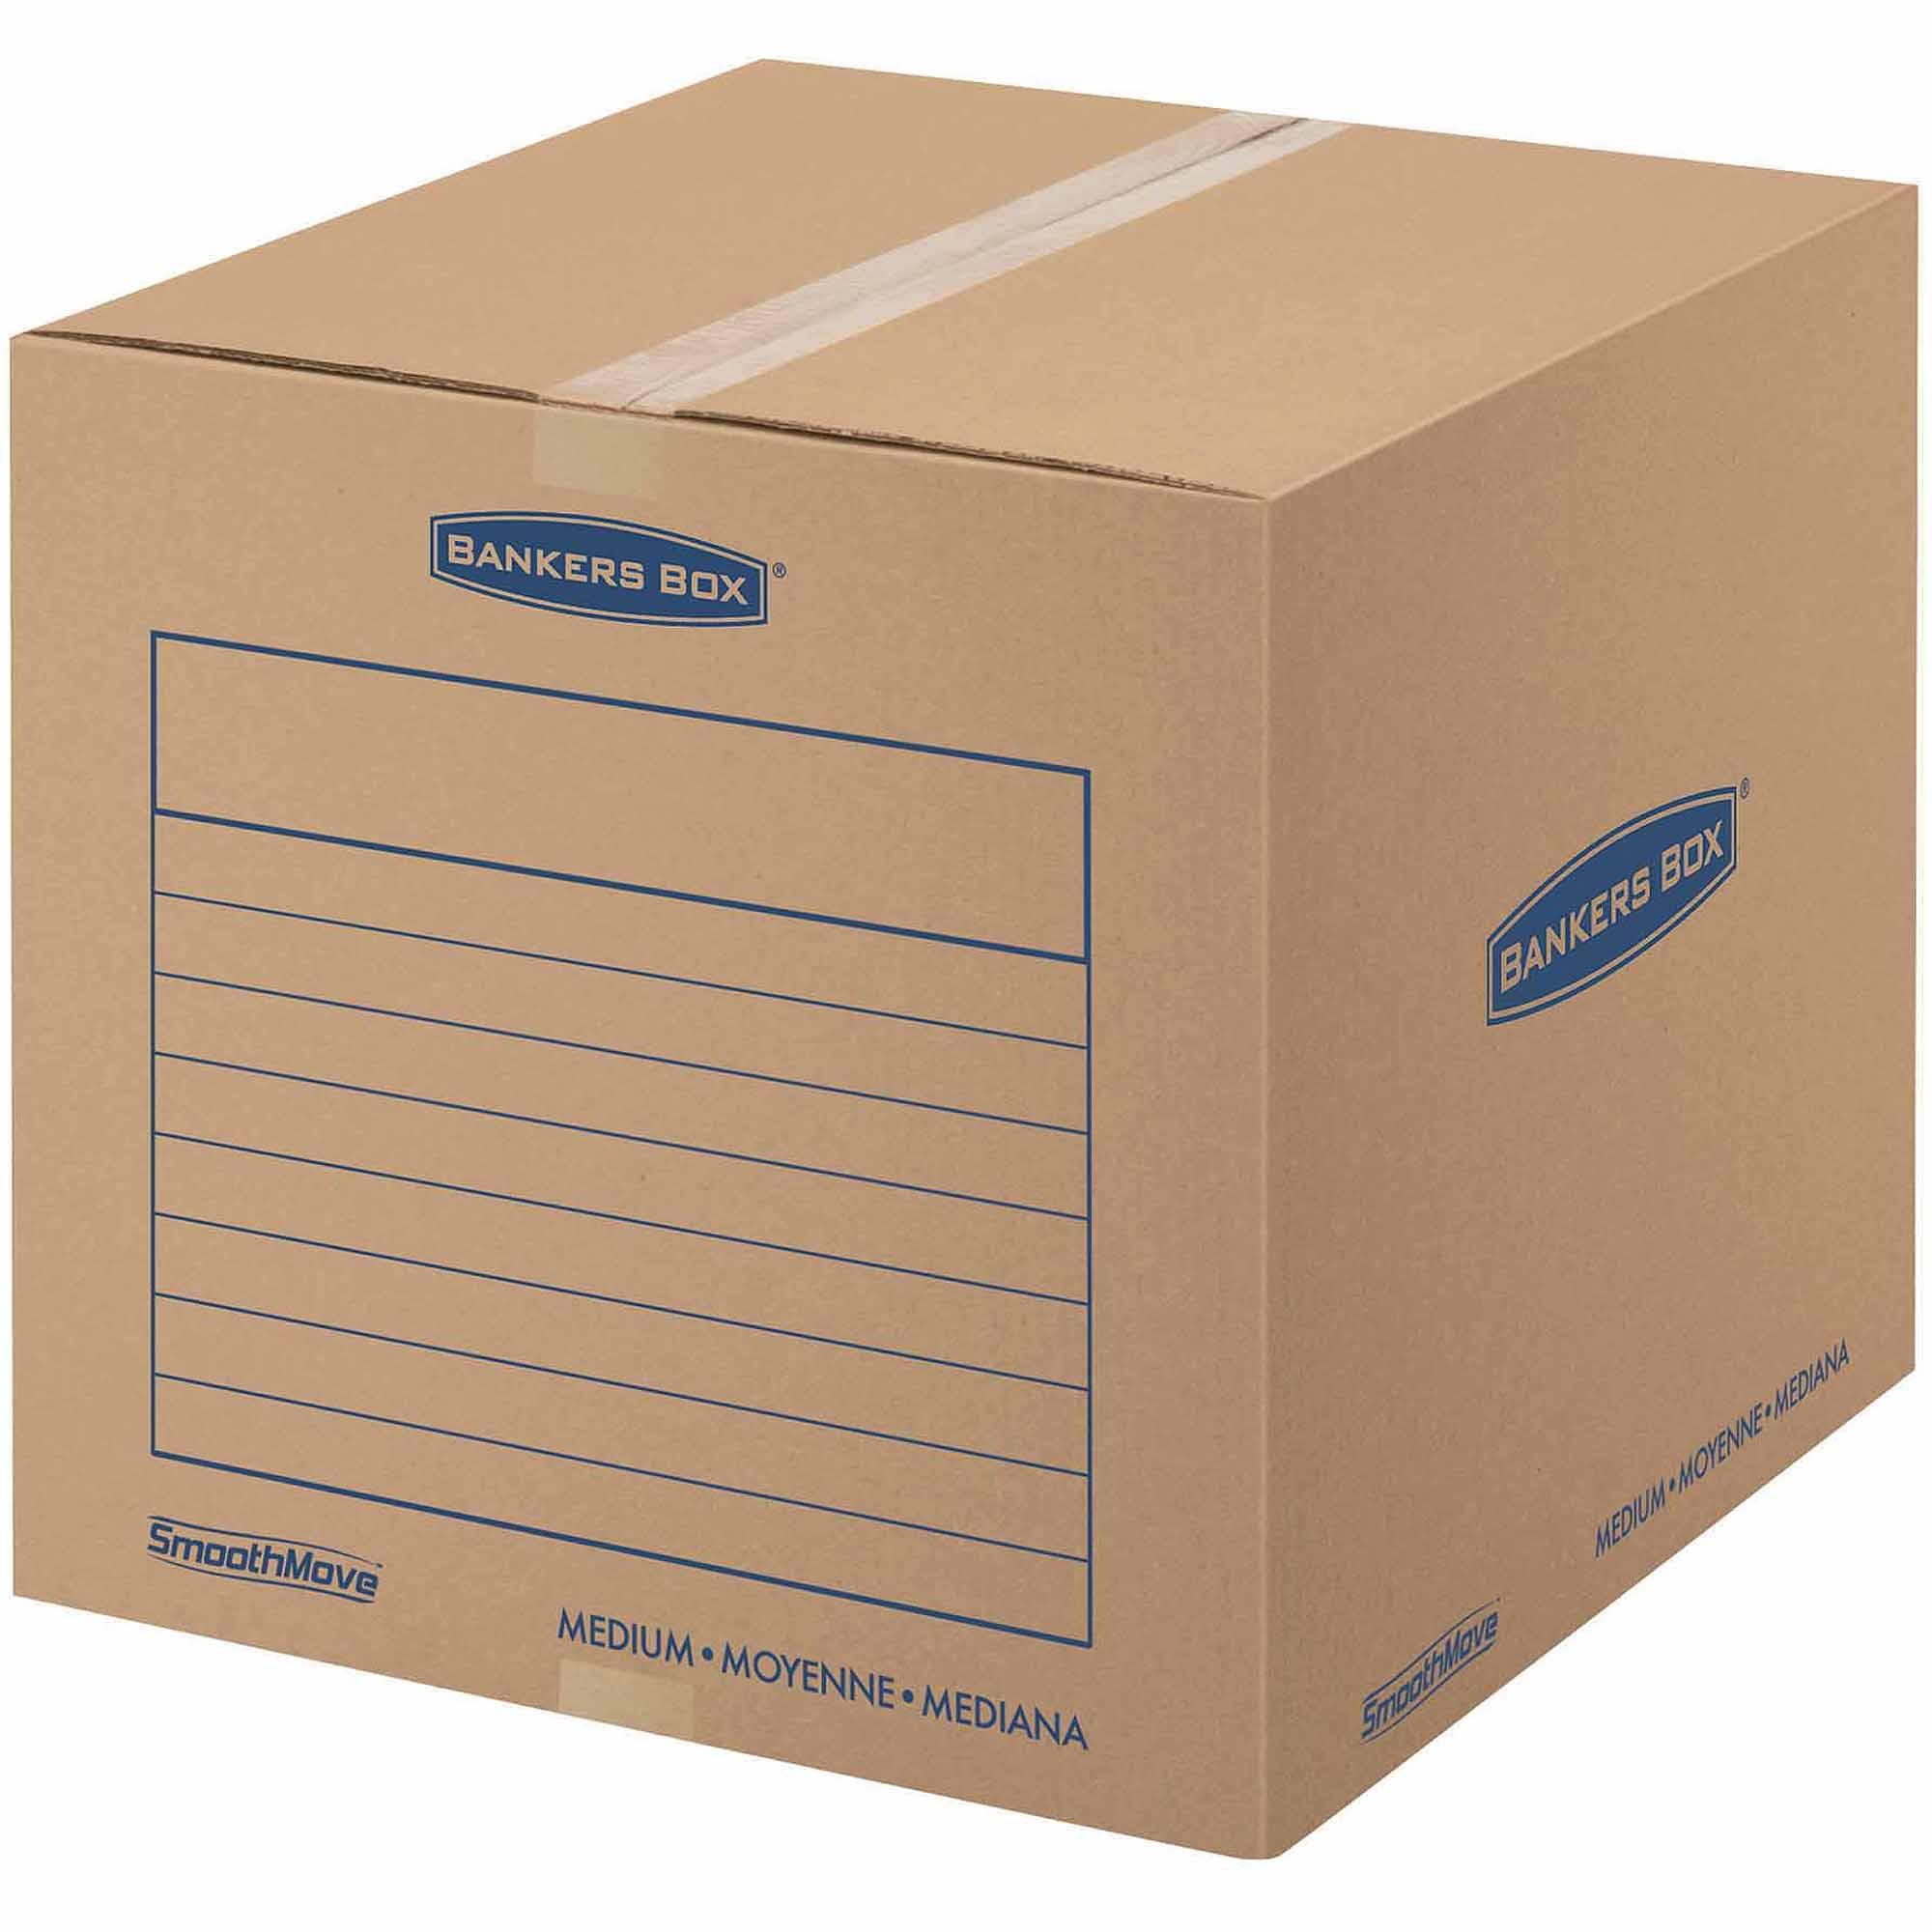 Bankers Box Smoothmove Basic Storage and Moving Box, Medium, 10pk